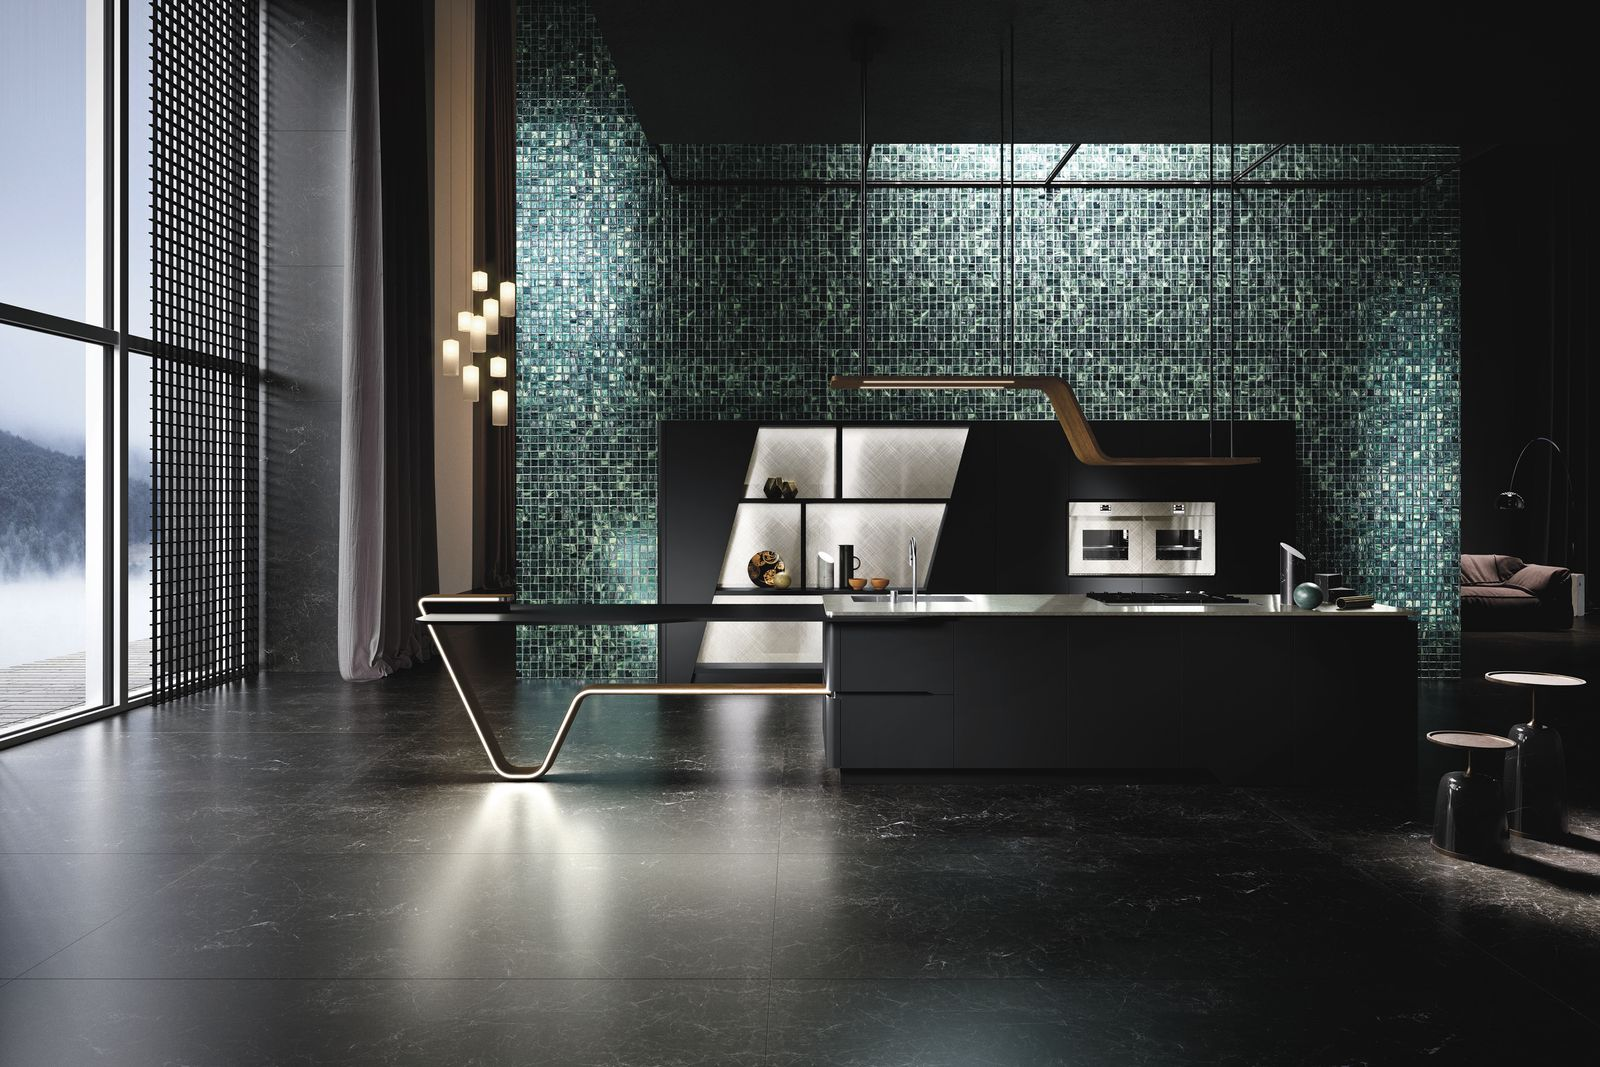 Italian design Snaidero and Pininfarina JC Packer's Hoffen Ola Vision